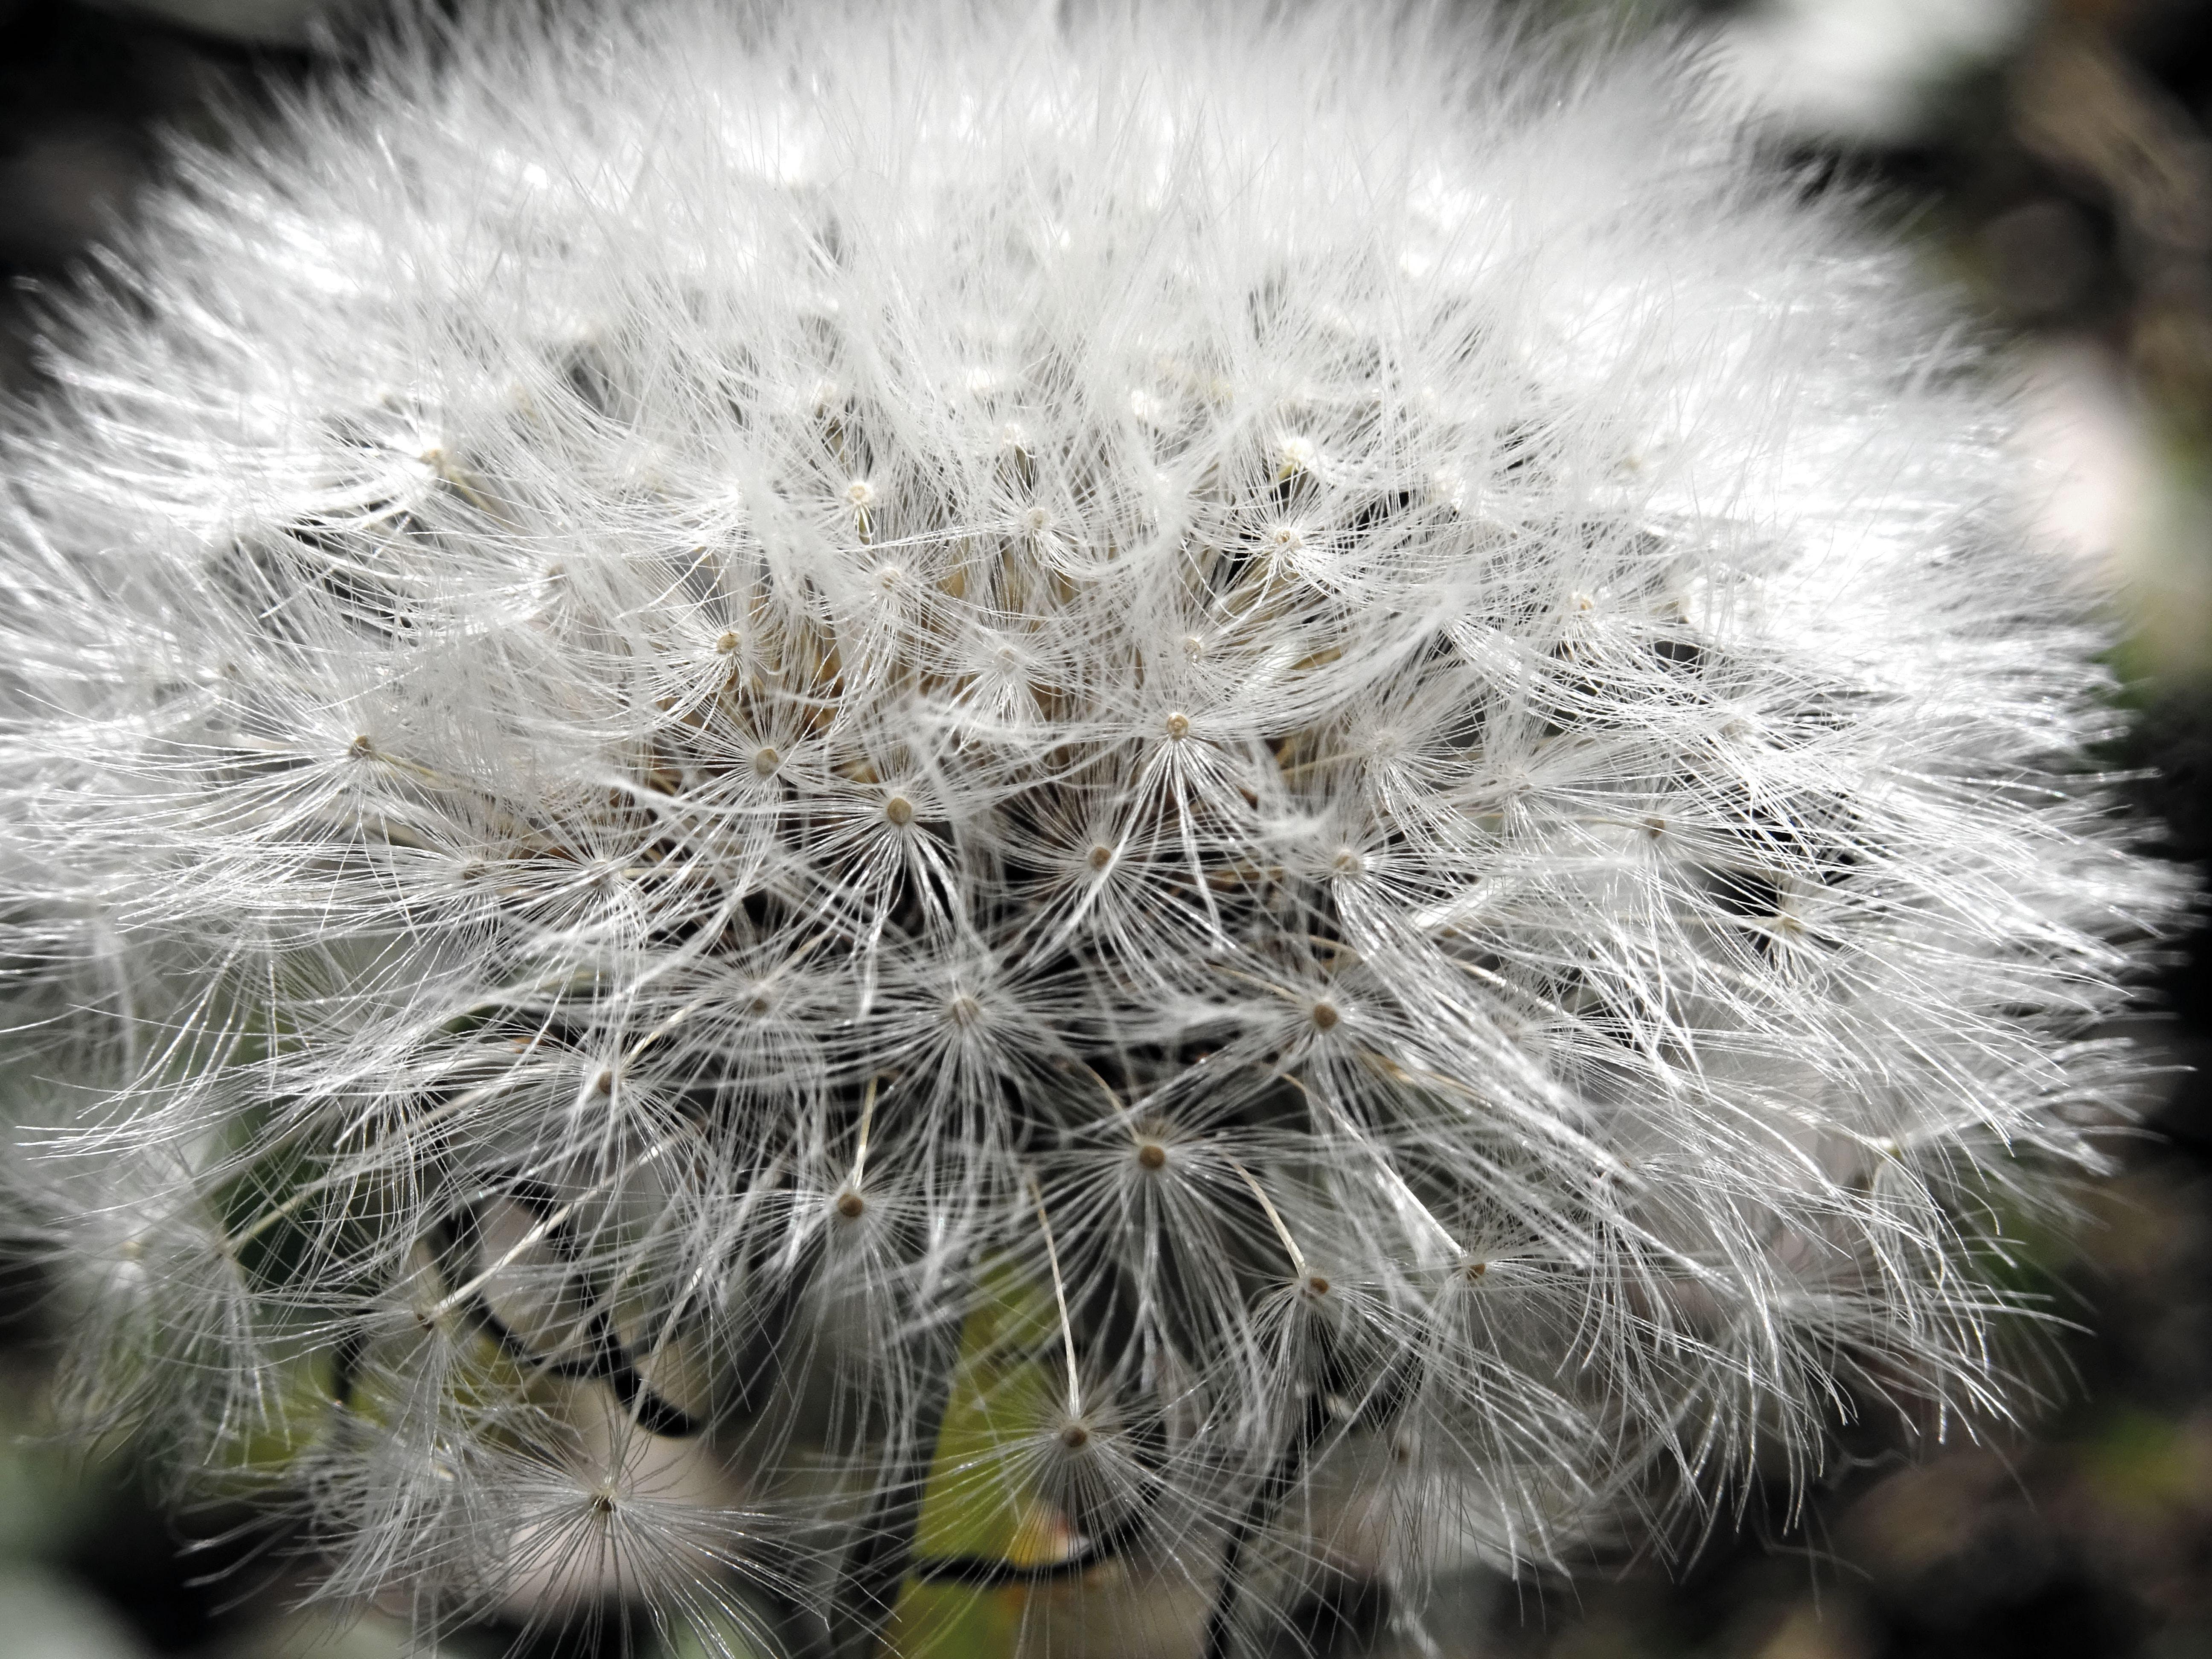 Closeup Photo of White Dandelion